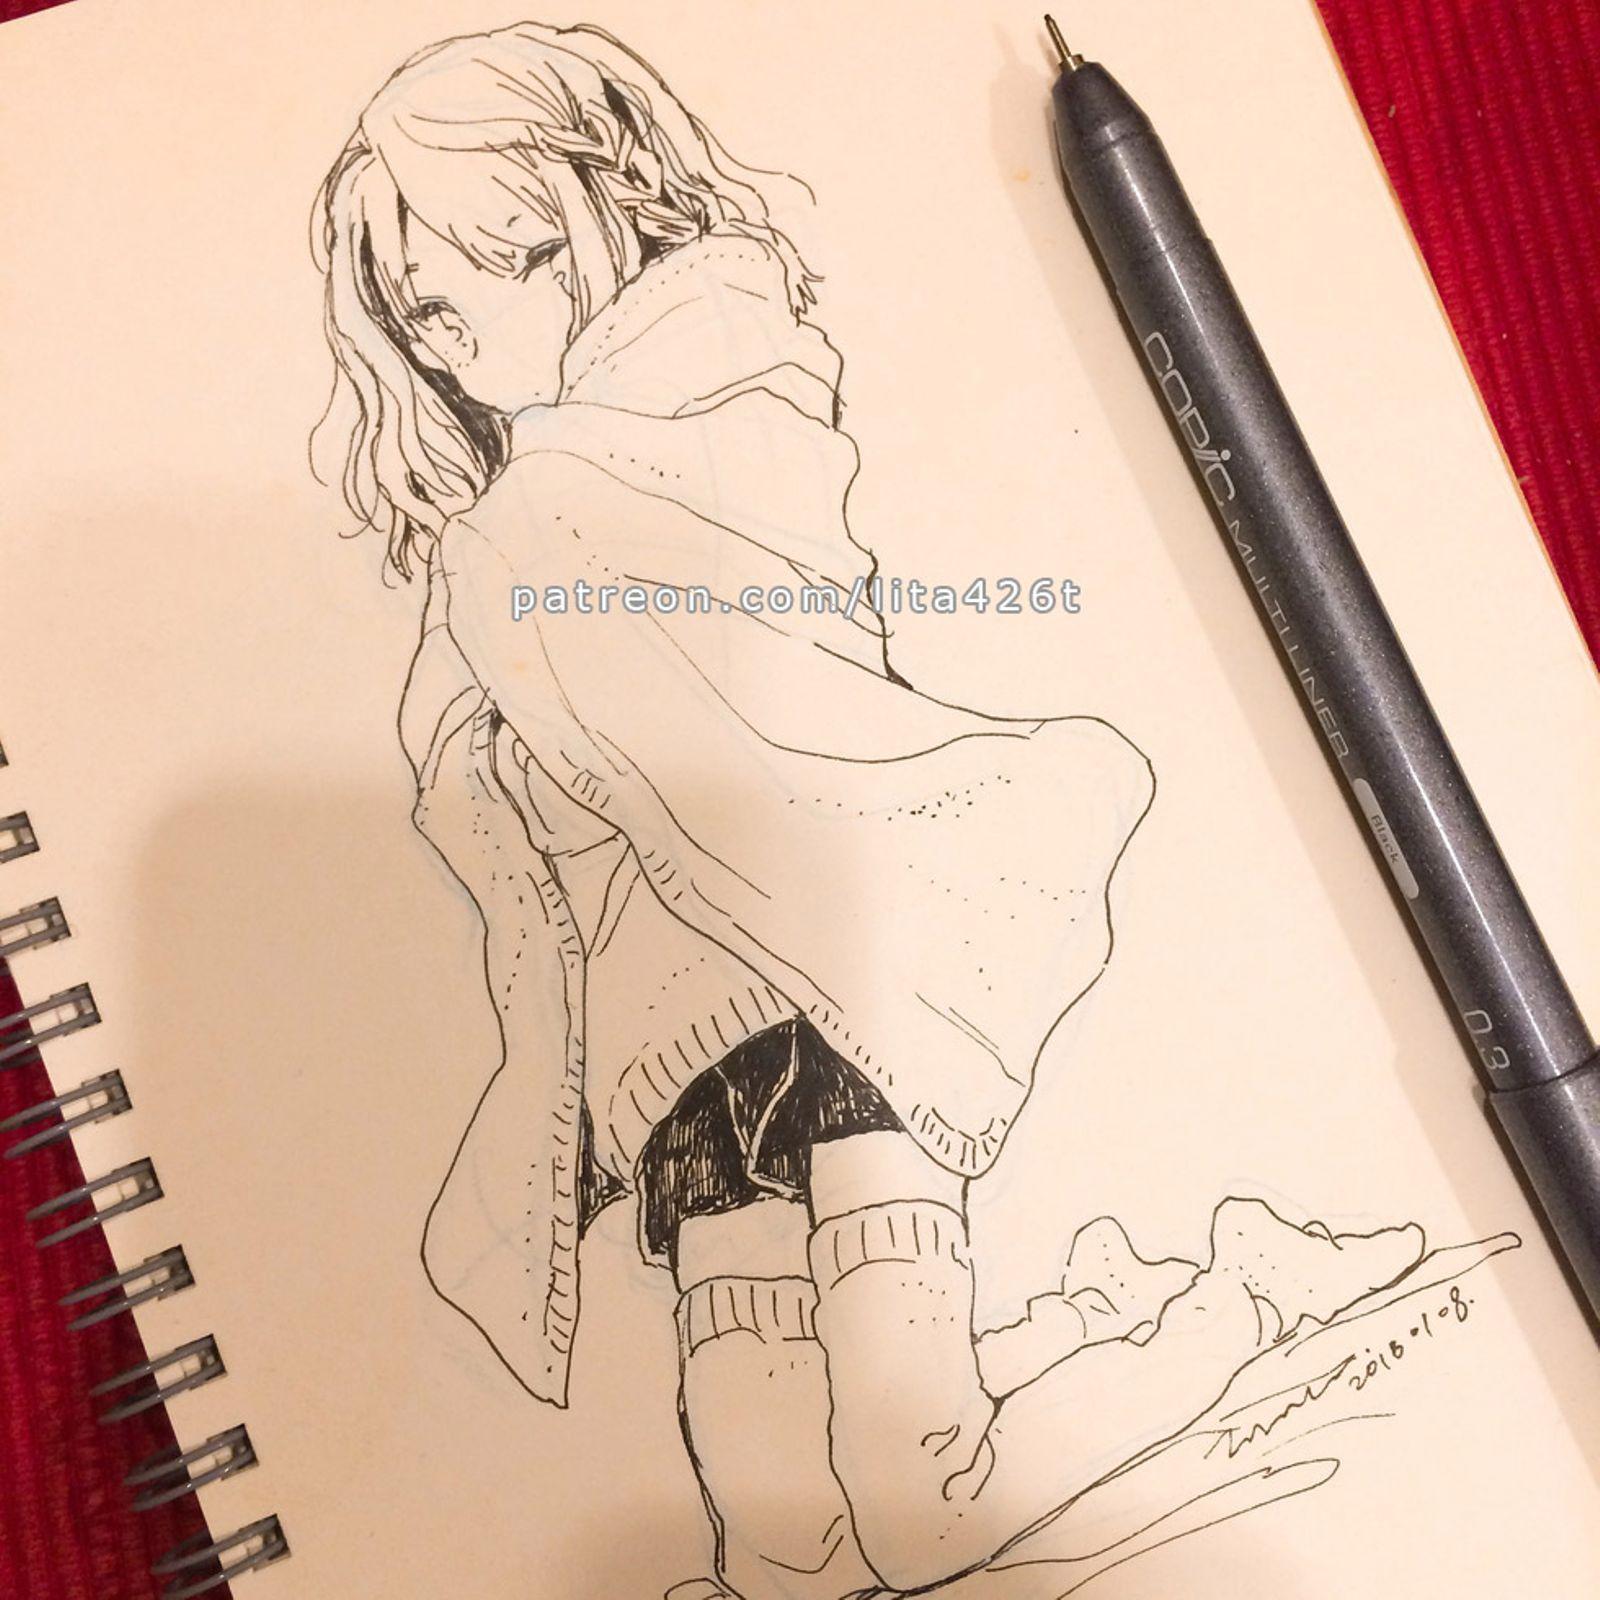 blanket | Tachibana Lita on Patreon